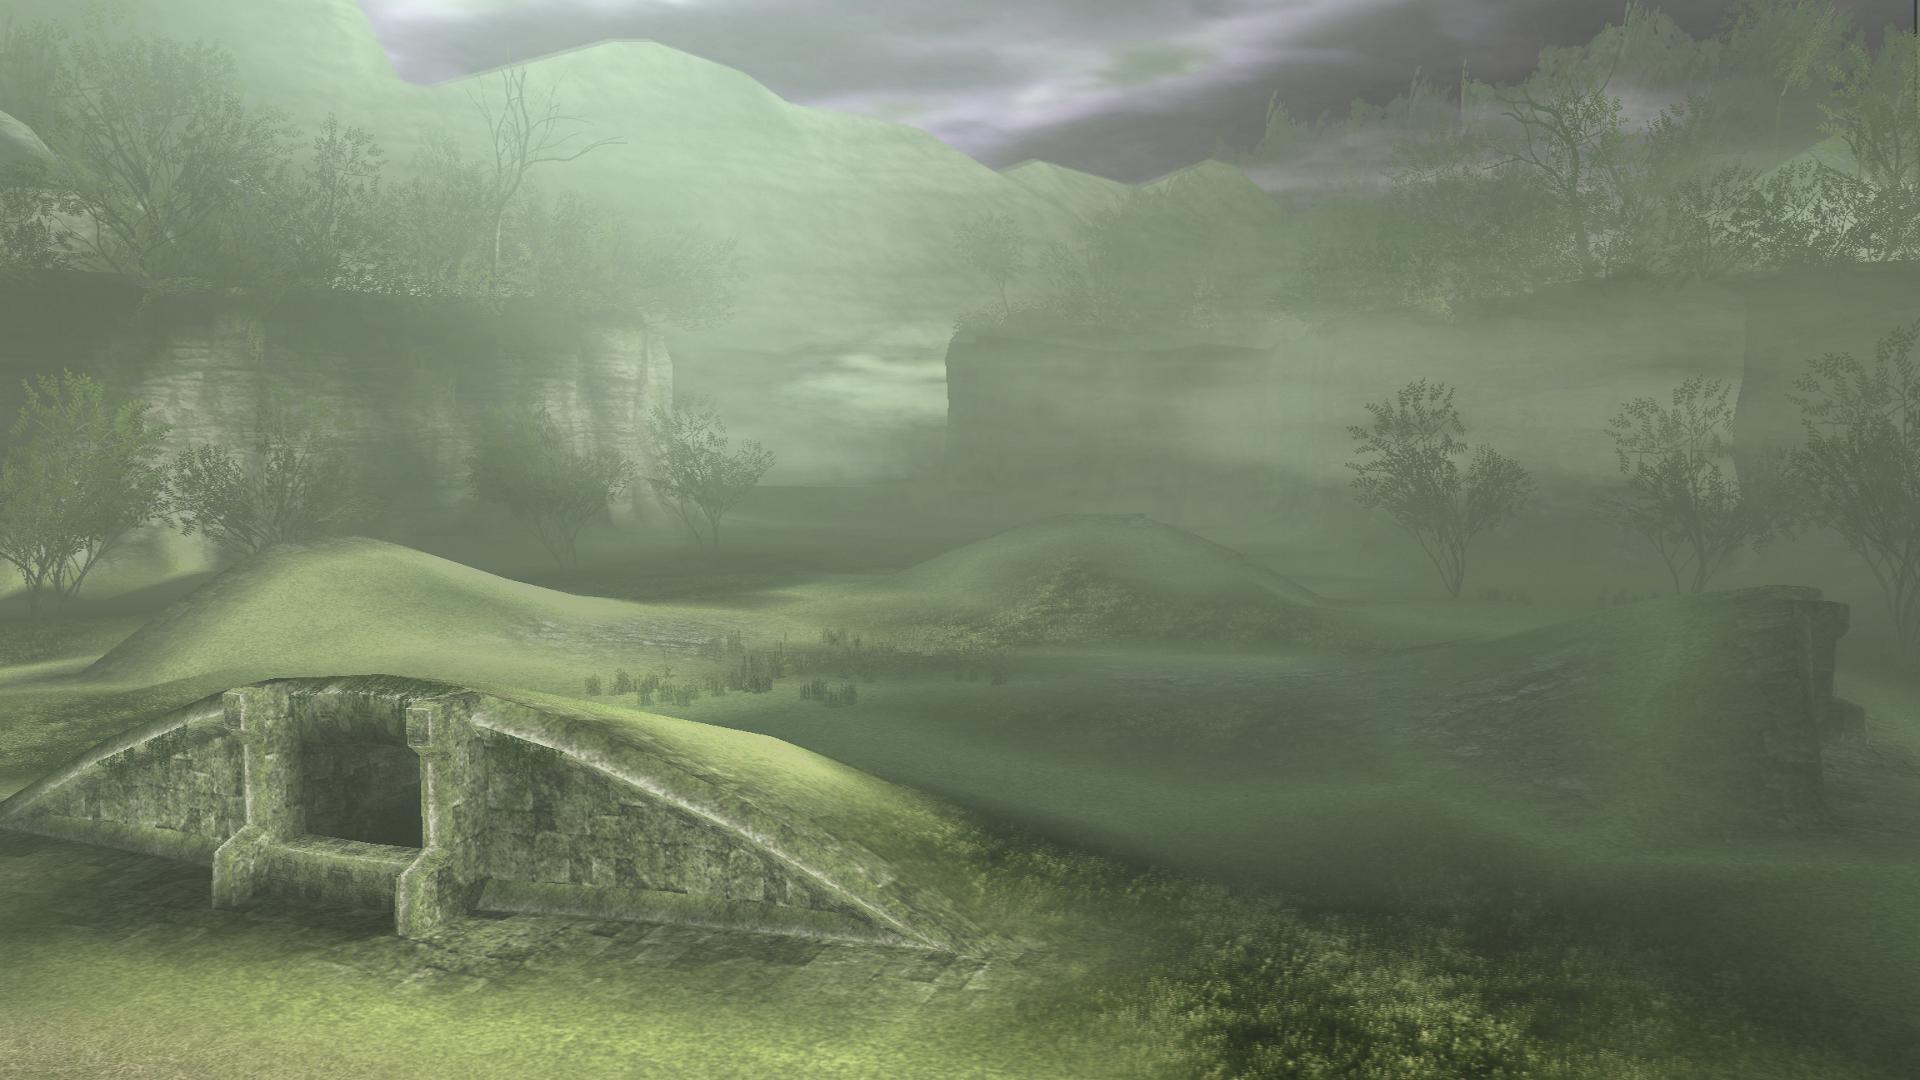 Kirin's Hill